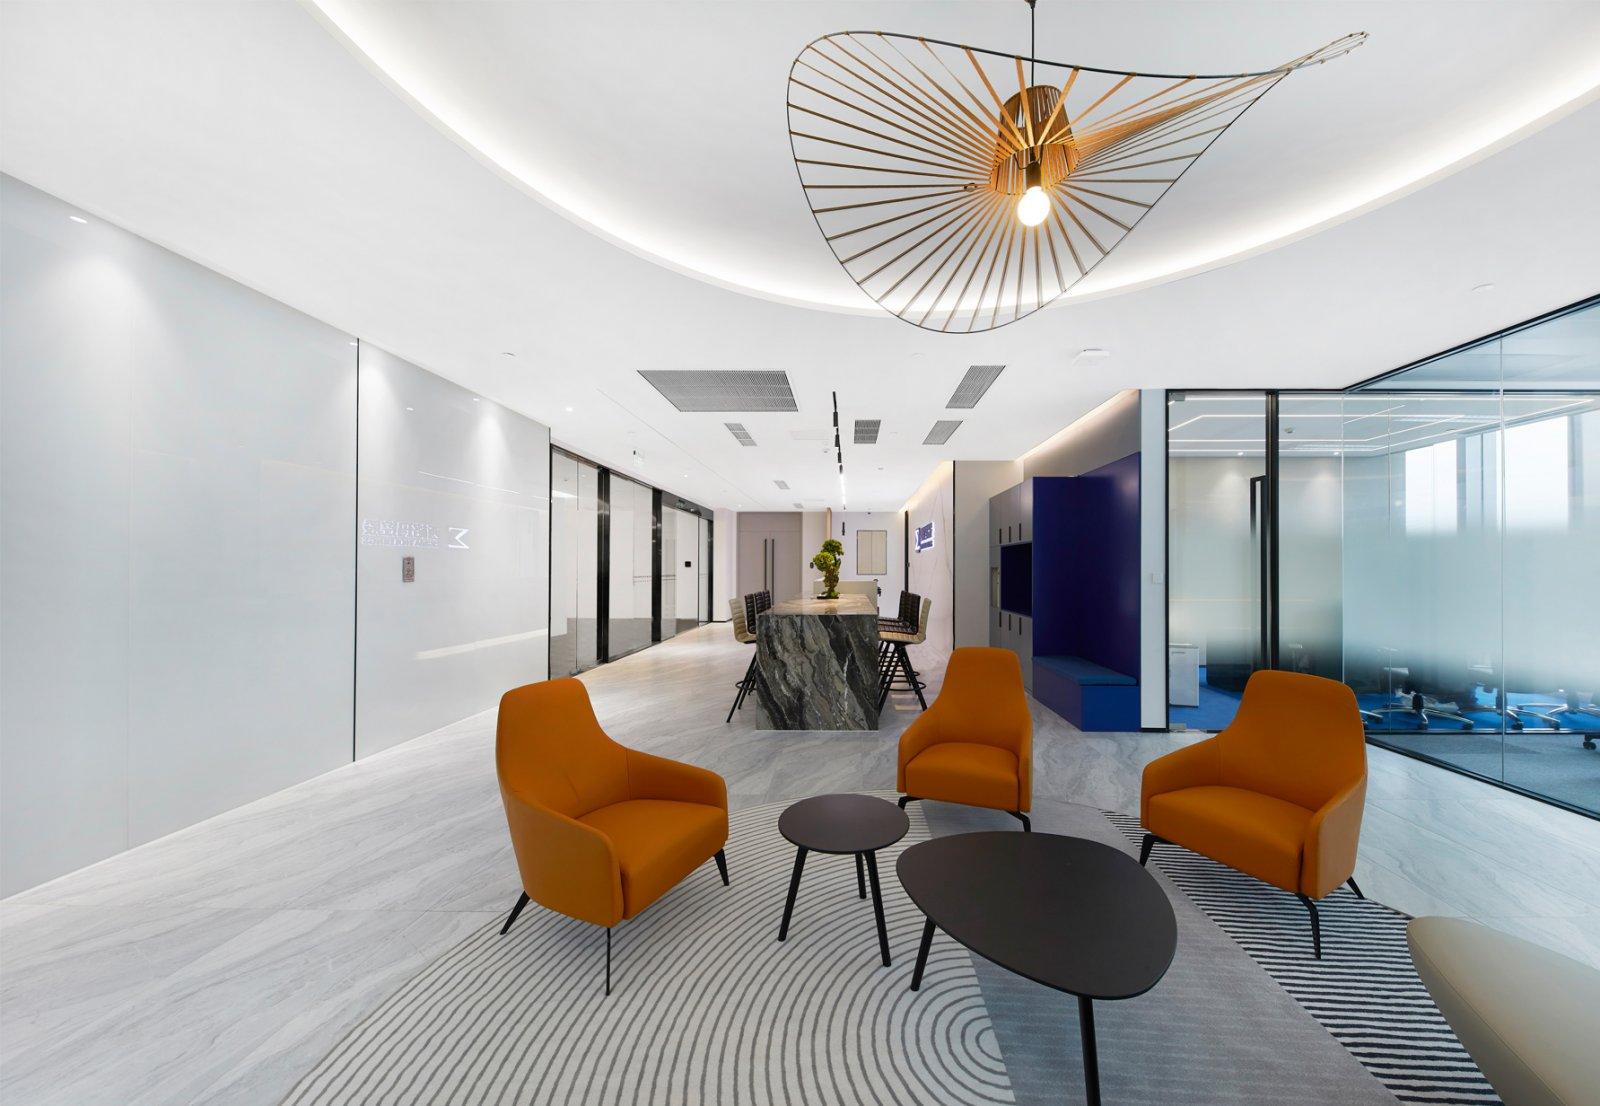 SI装修设计室内3D效果图空间展厅展会餐饮店铺公装办公室设计